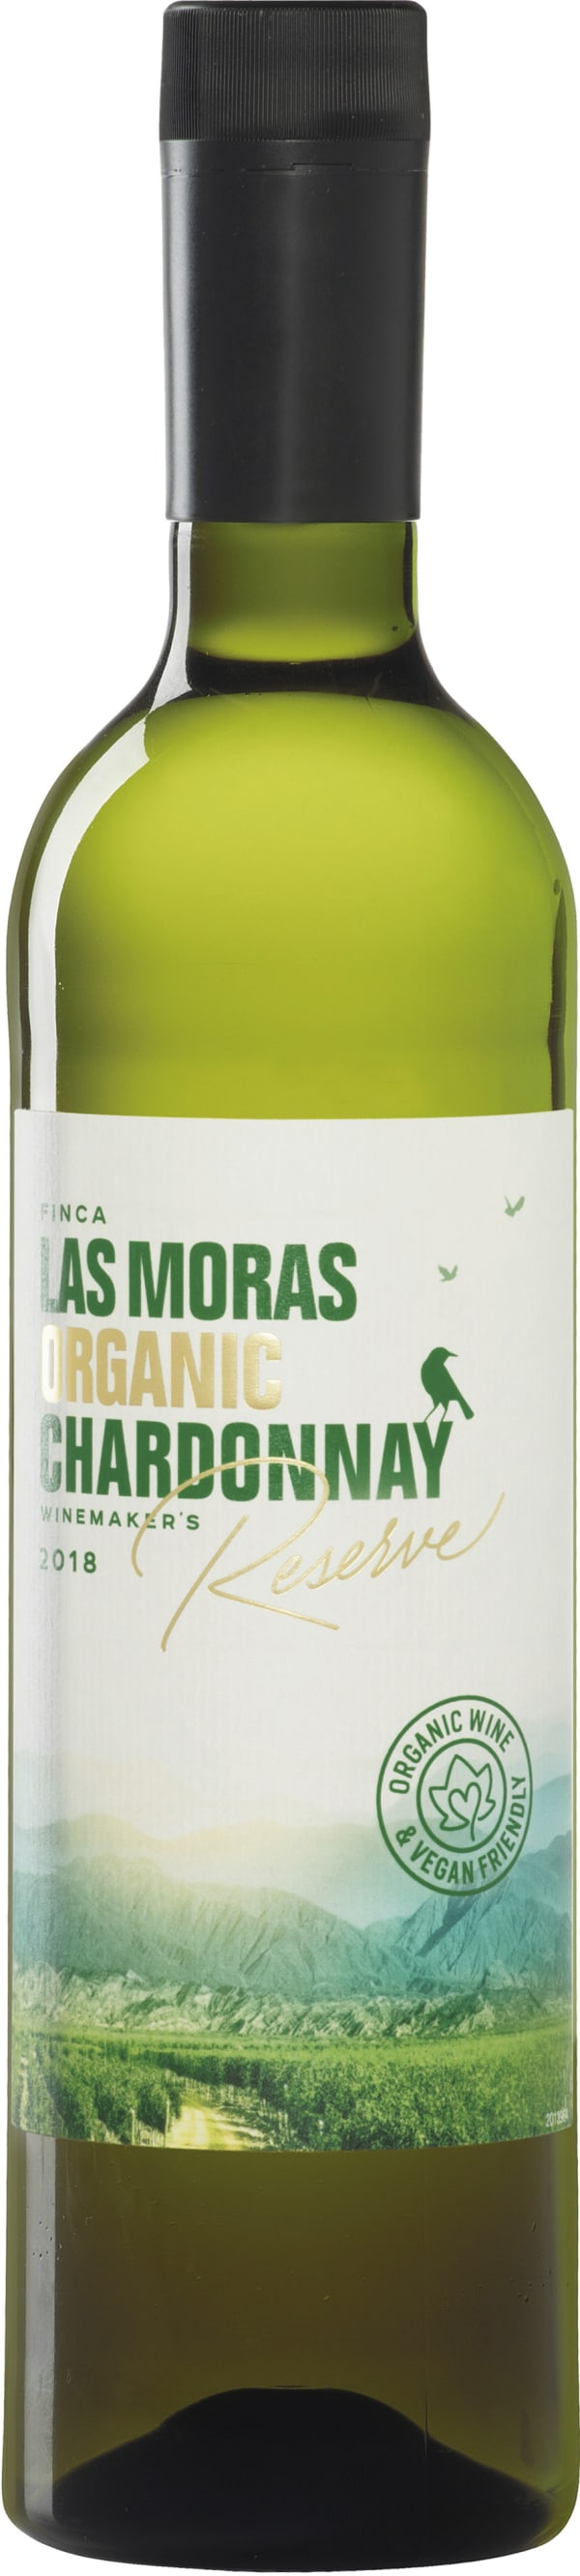 Finca Las Moras Organico Reserve Chardonnay 2016 muovipullo